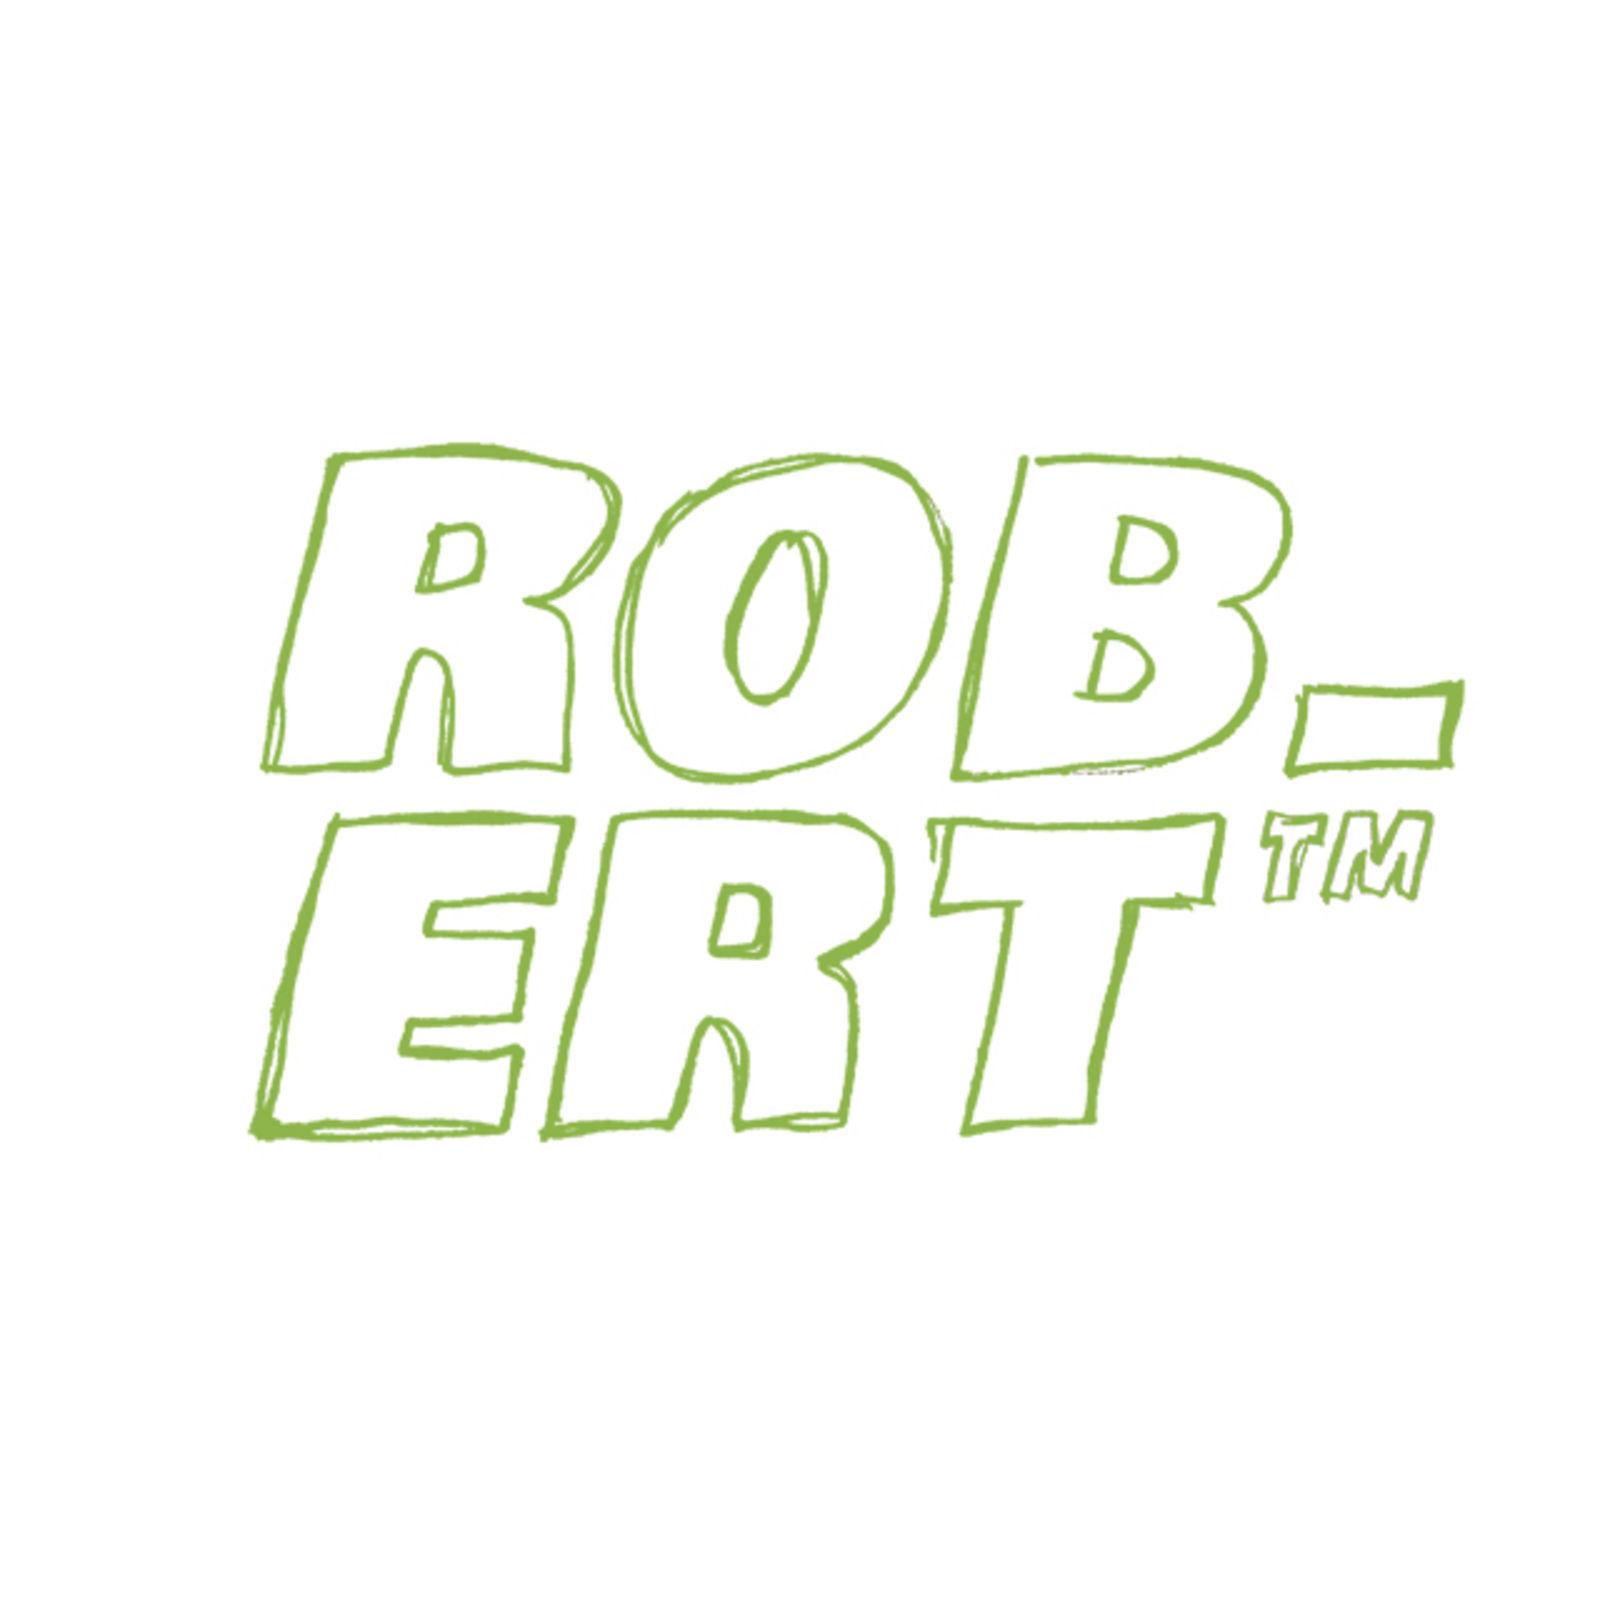 ROB-ERT